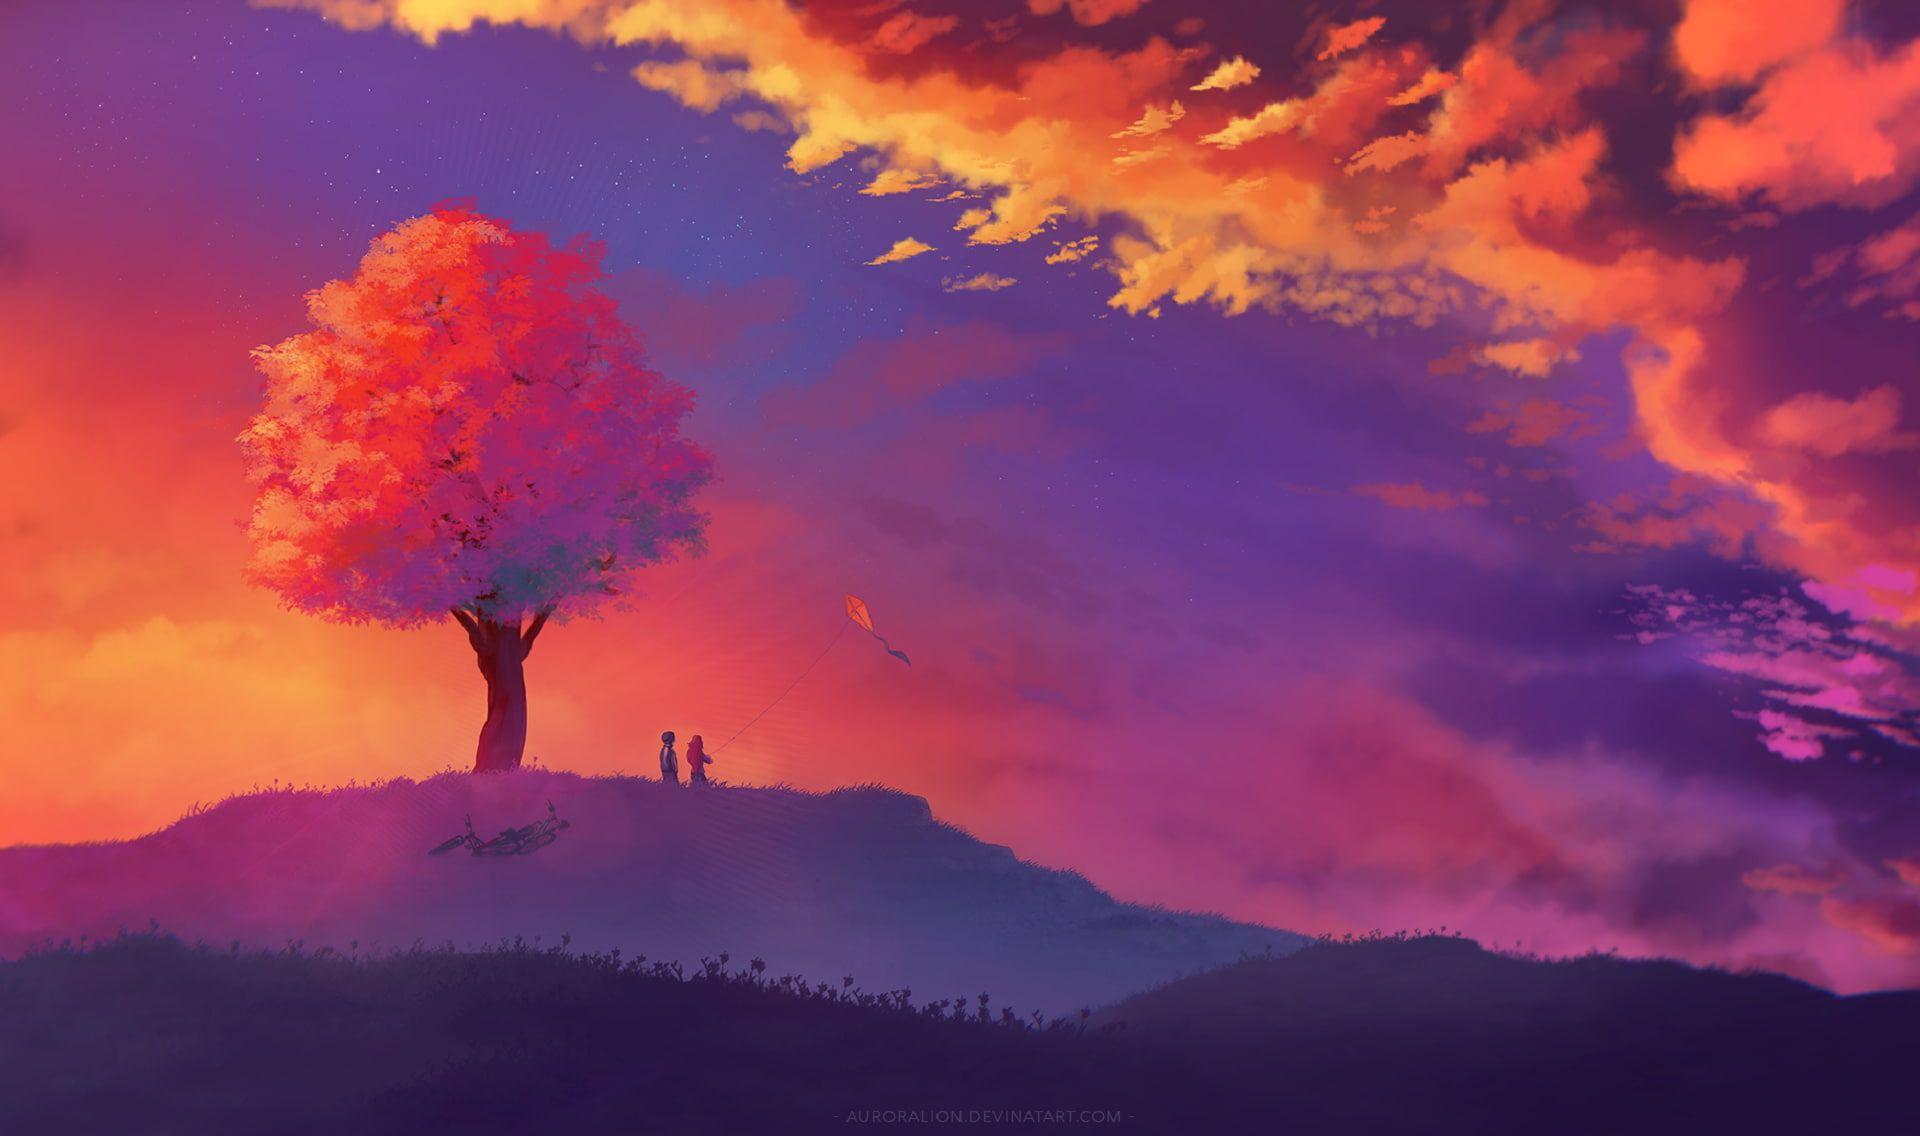 #illustration #landscape tree bark #nature fantasy art #sunset #1080P #wallpaper #hdwallpaper #desktop